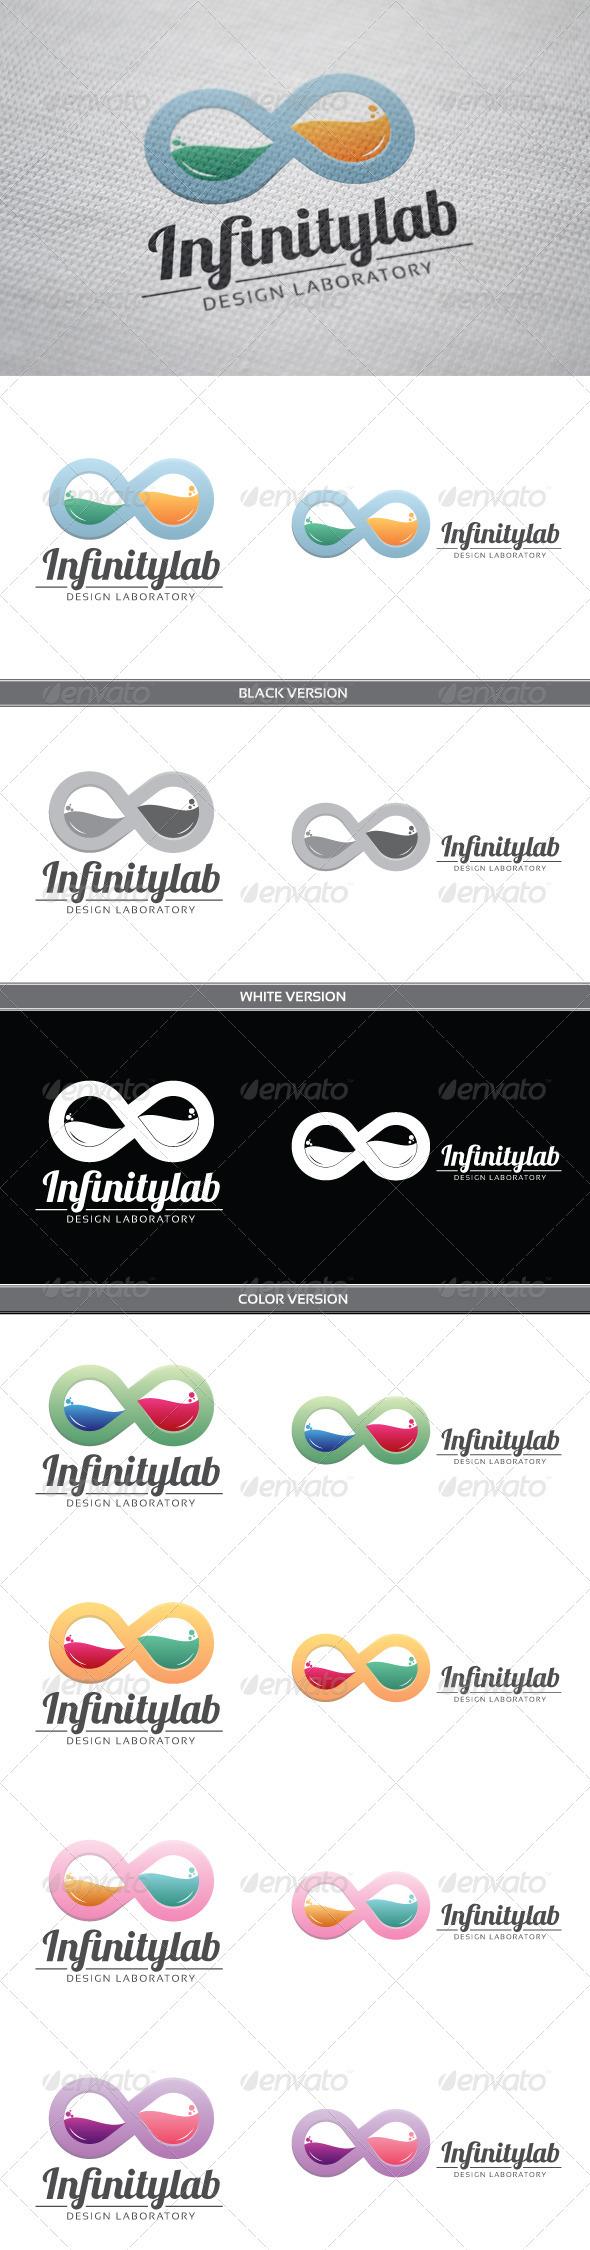 GraphicRiver Infinitylab Logo 3728531